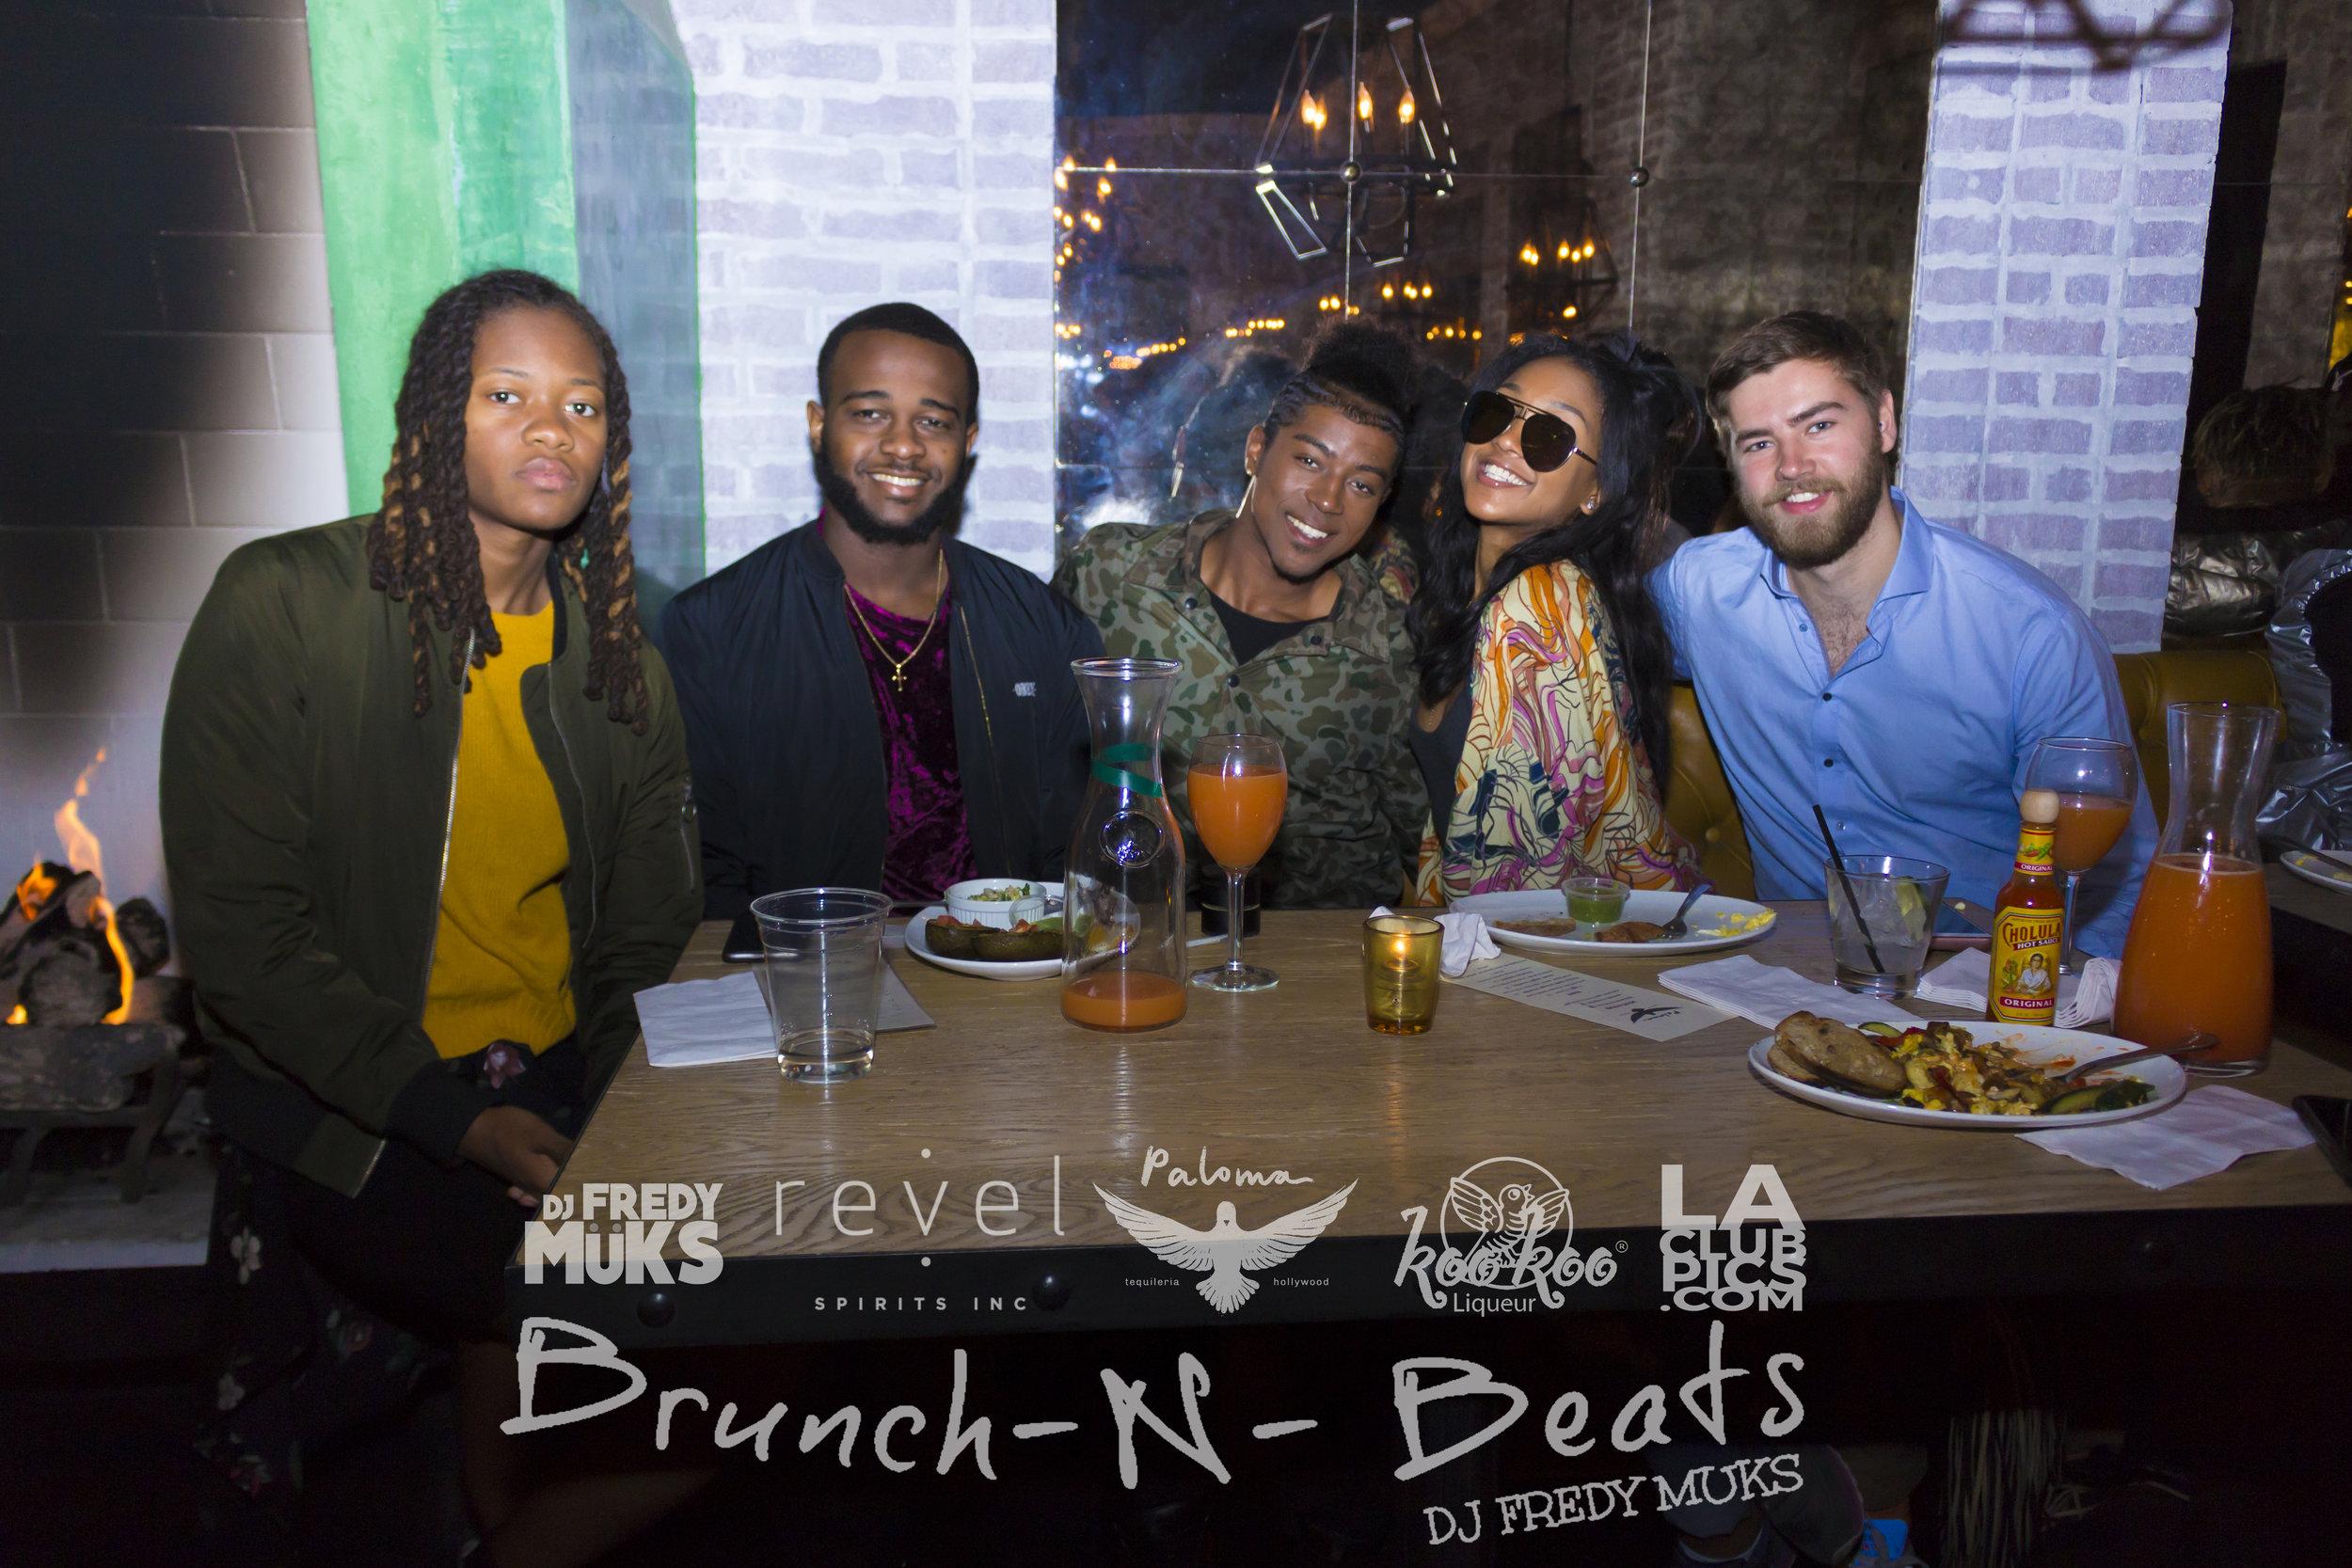 Brunch-N-Beats - Paloma Hollywood - 02-25-18_101.jpg